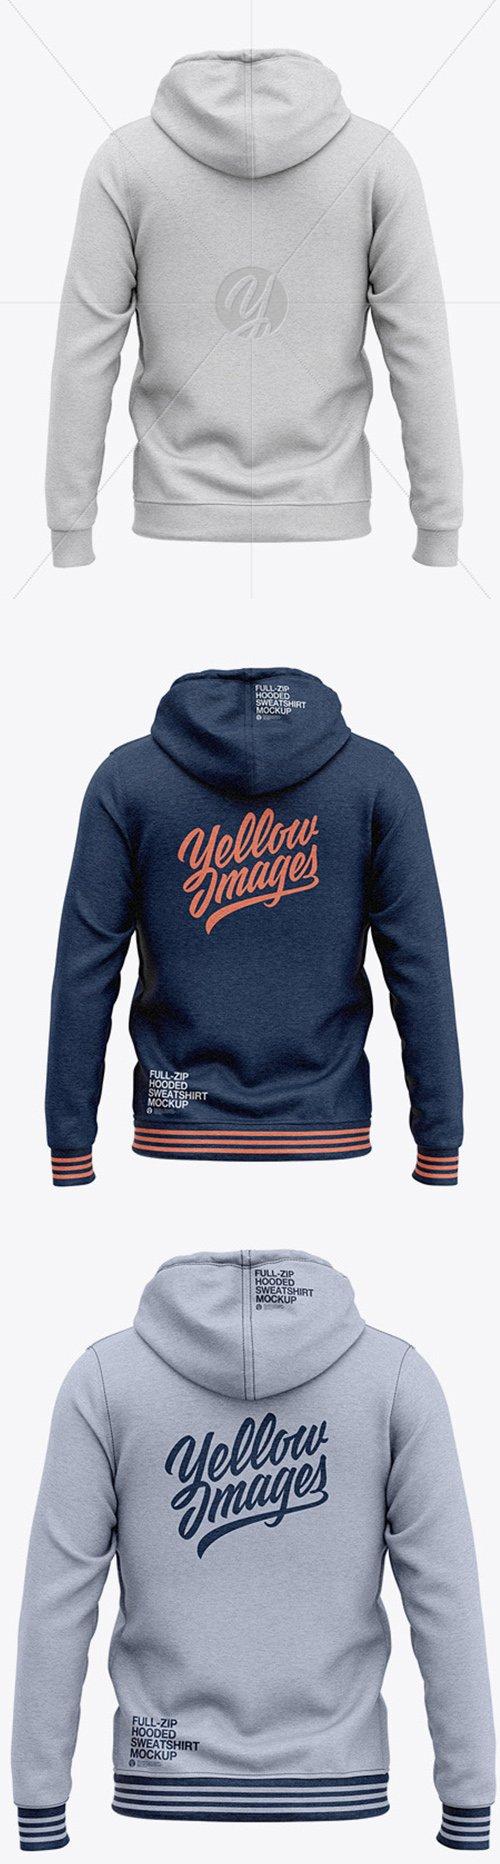 Full-Zip Heather Hooded Sweatshirt - Back View 48954